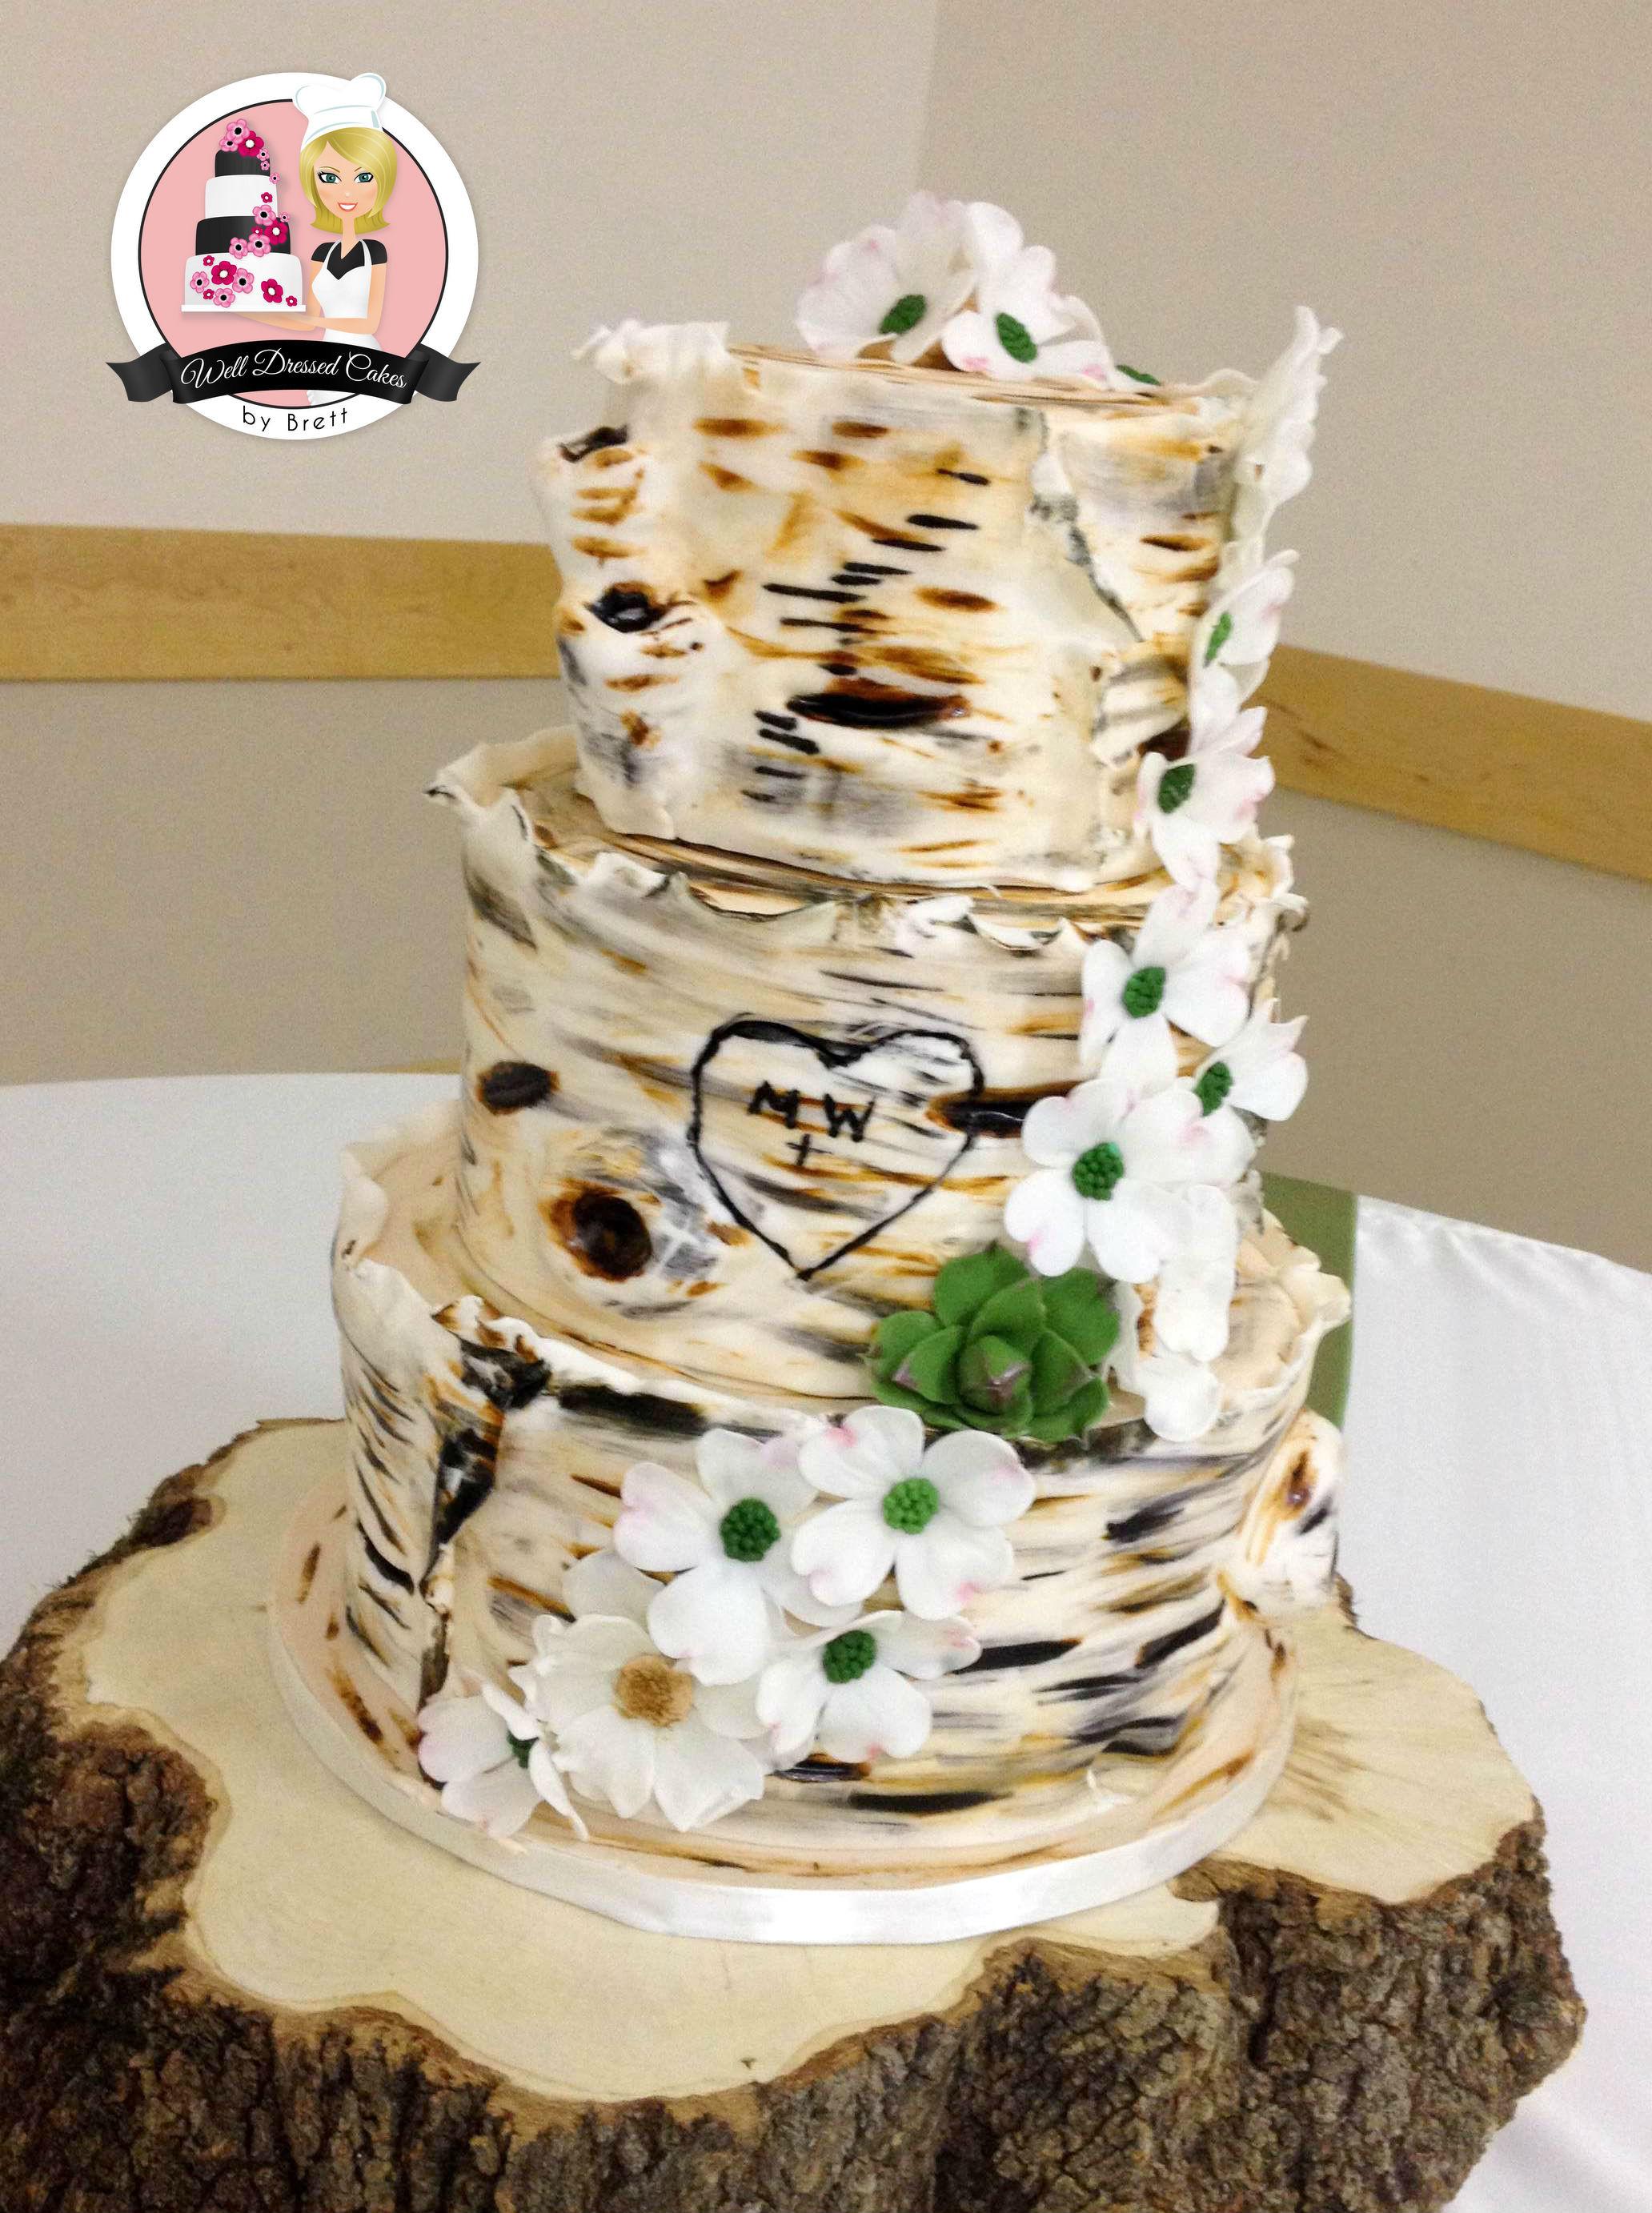 White Birch Wedding Cake  Well Dressed Cakes by Brett – Wedding Cakes